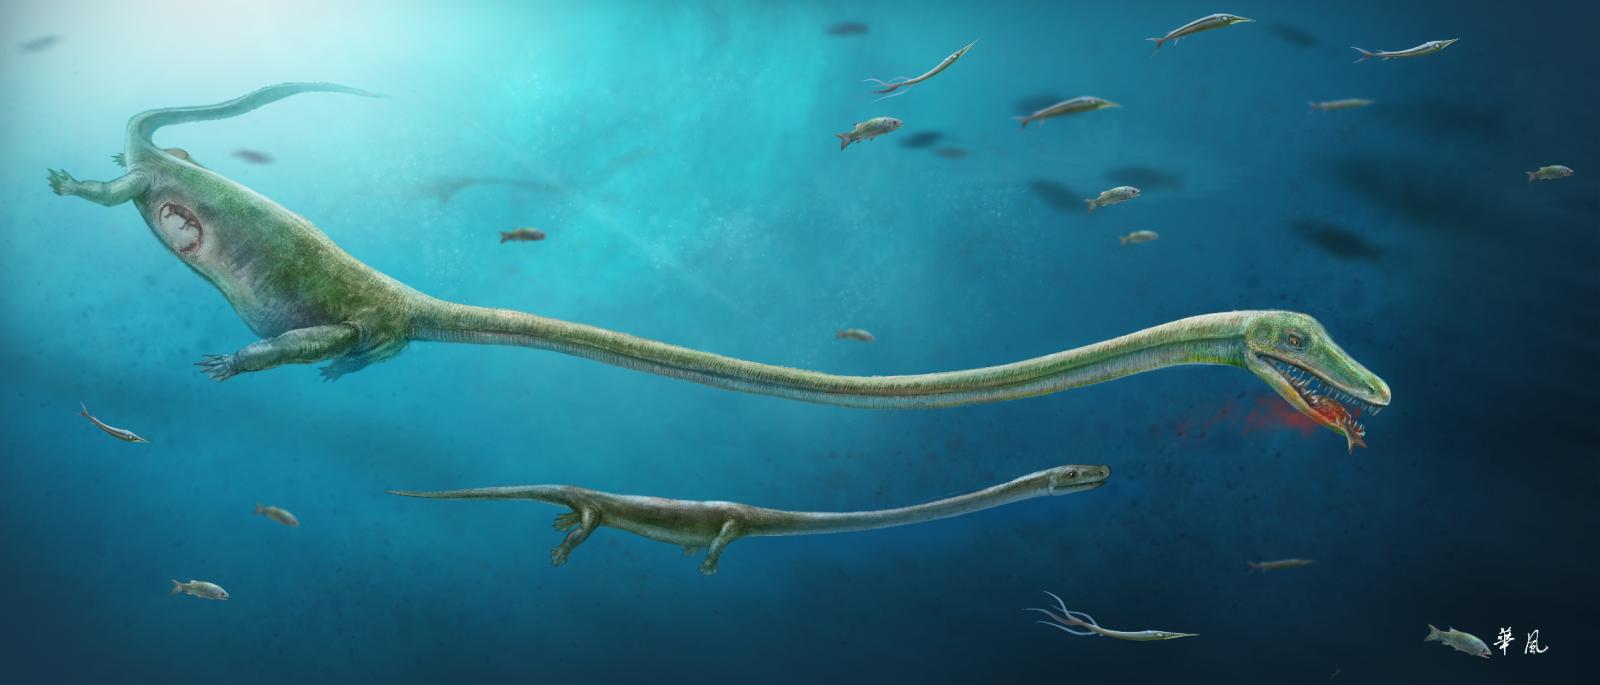 Dinocephalosaurus